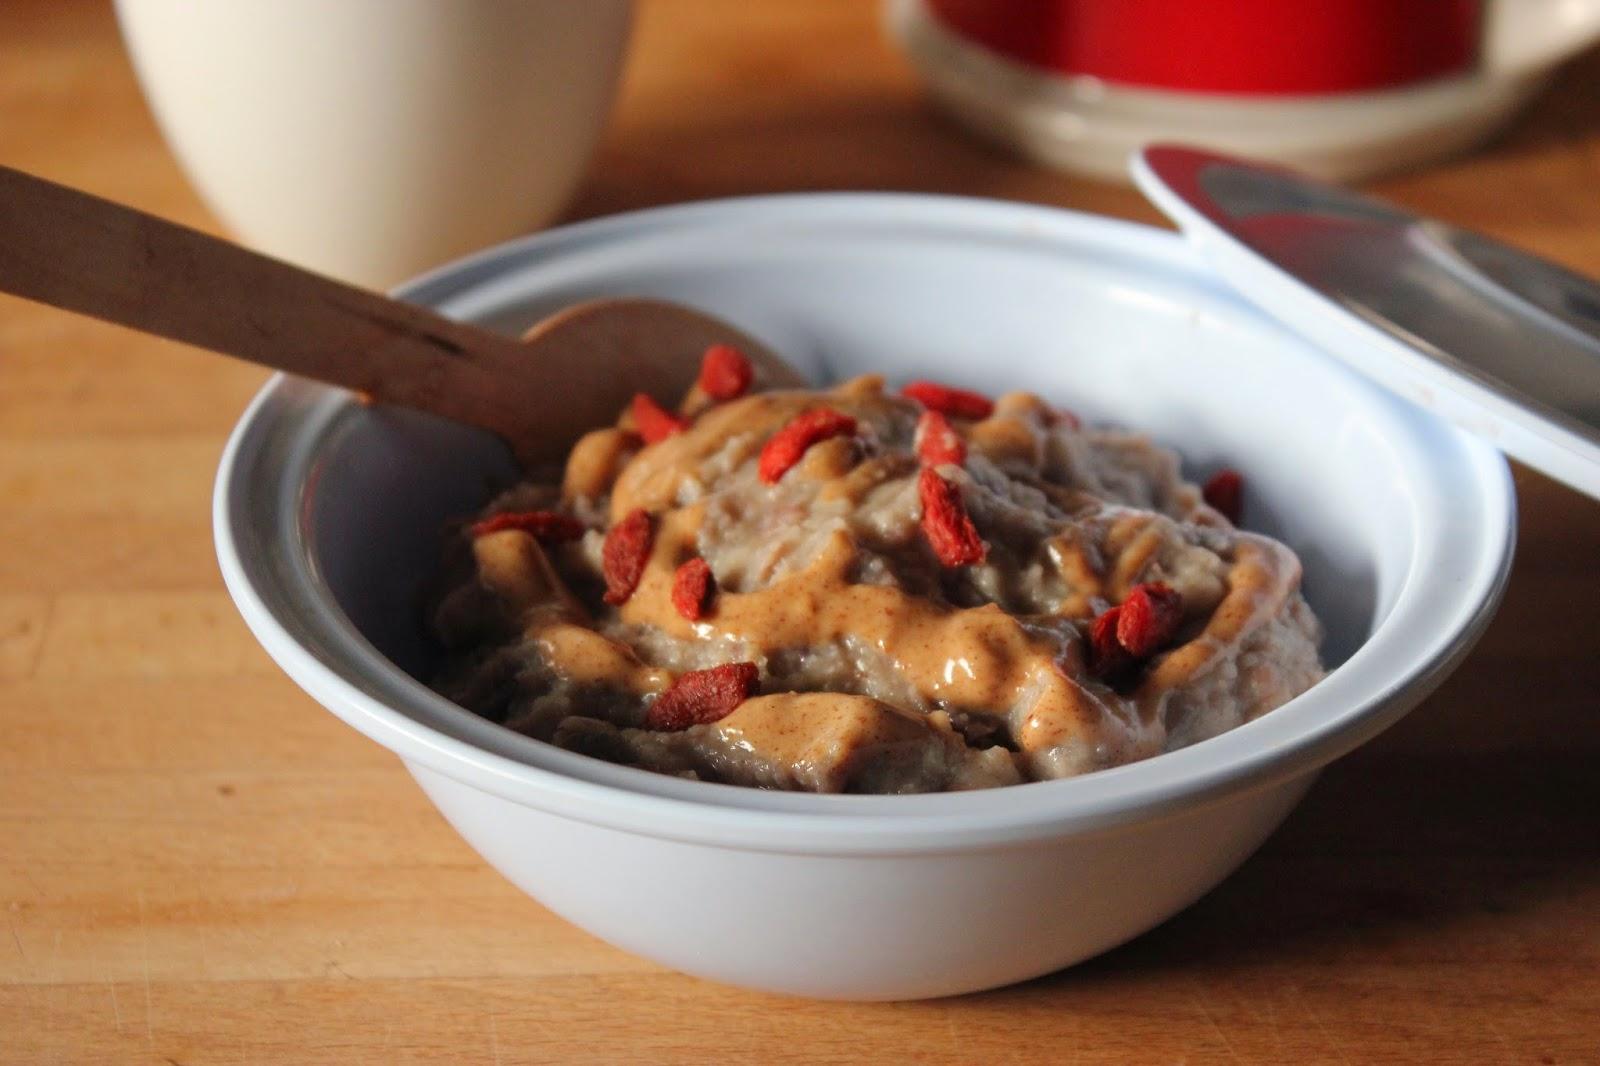 https://cuillereetsaladier.blogspot.com/2015/03/porridge-proteine-du-matin-vegan-et.html